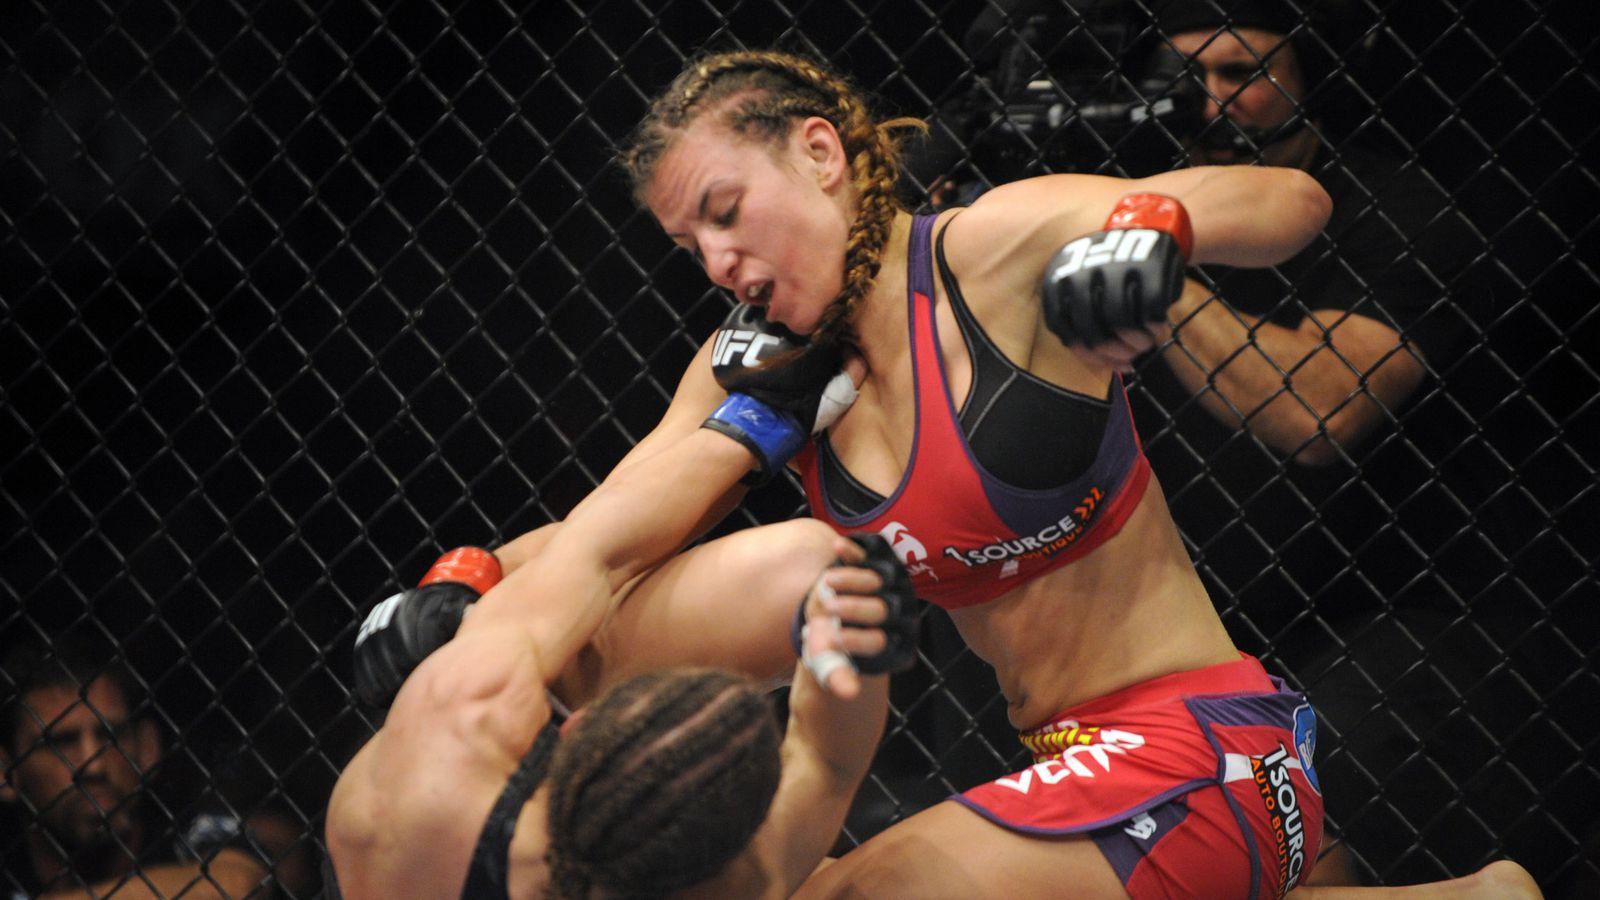 UFC Fight Night 52 results: Miesha Tate wins uninspired ...